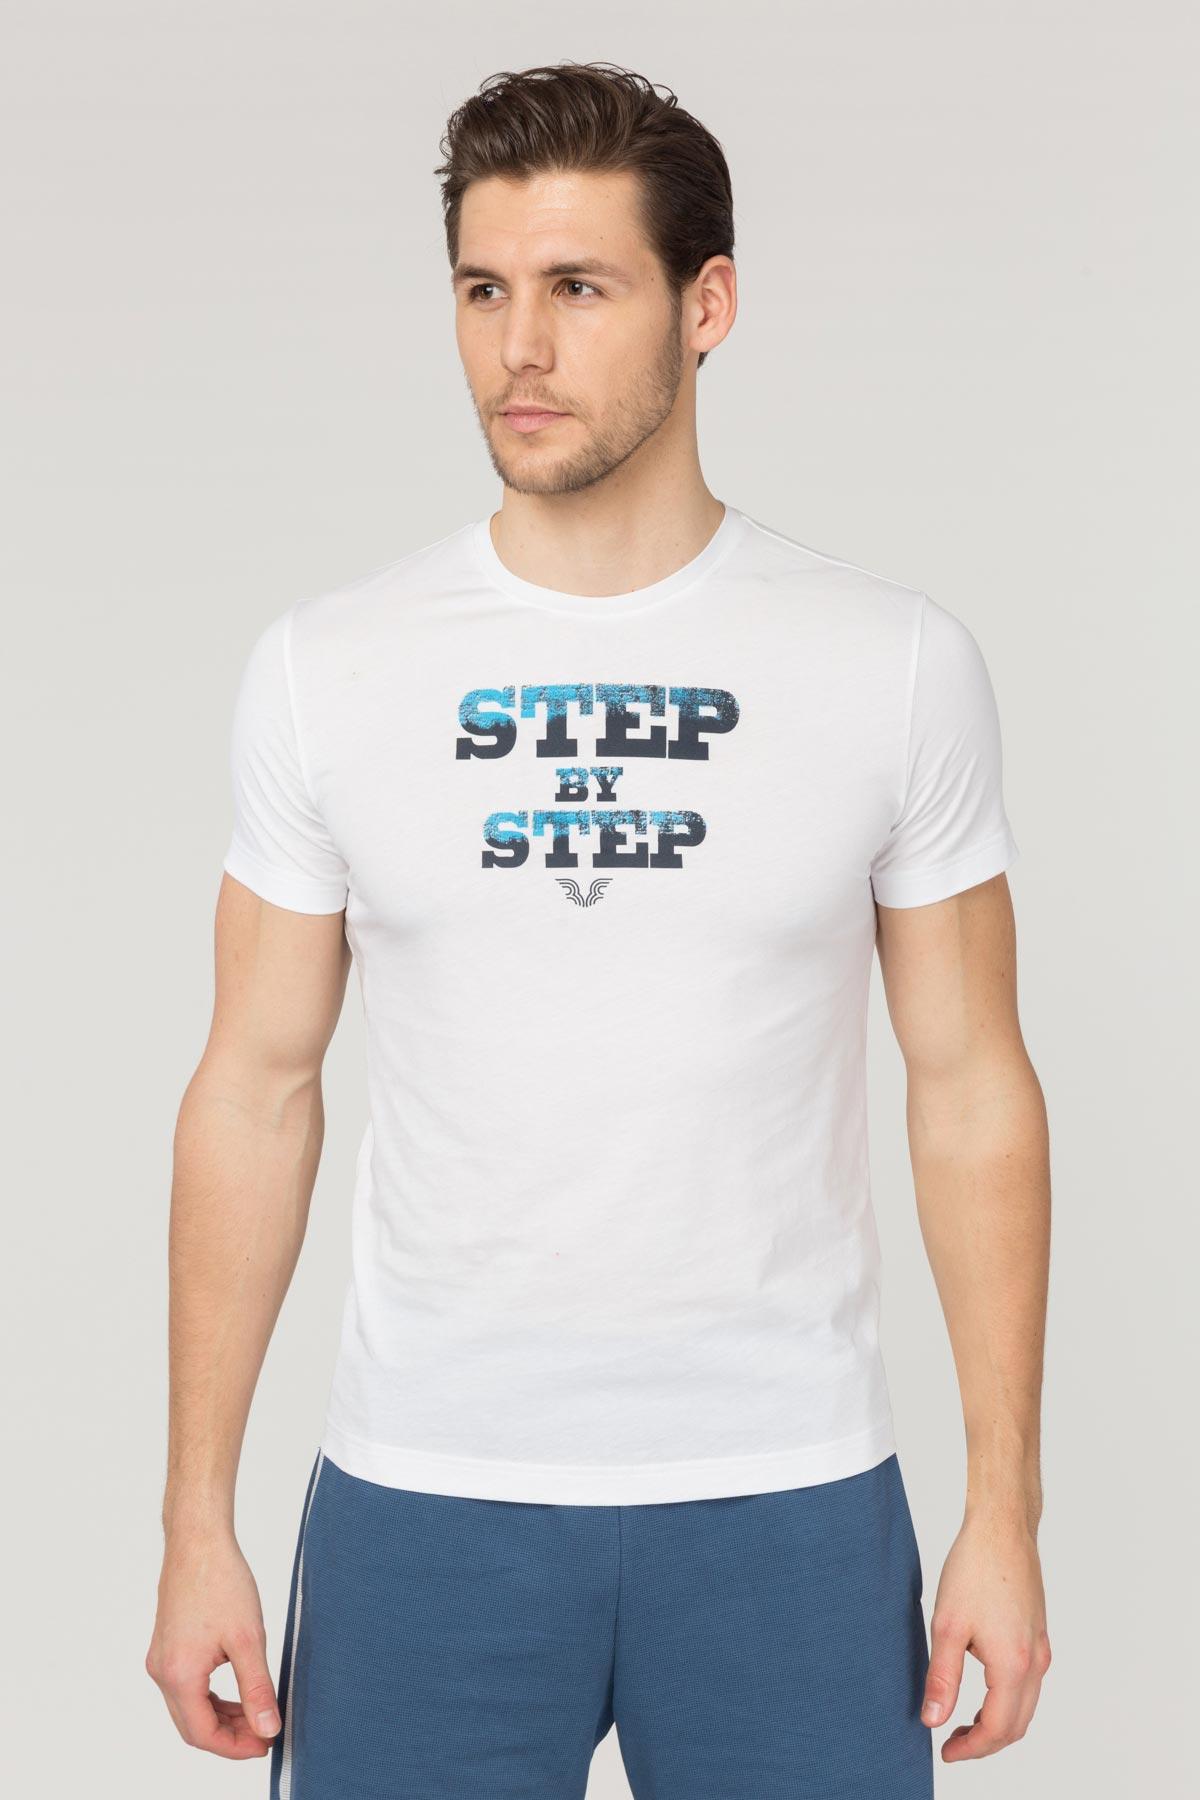 Bilcee Beyaz Pamuklu Erkek T-Shirt FS-1684 BİLCEE